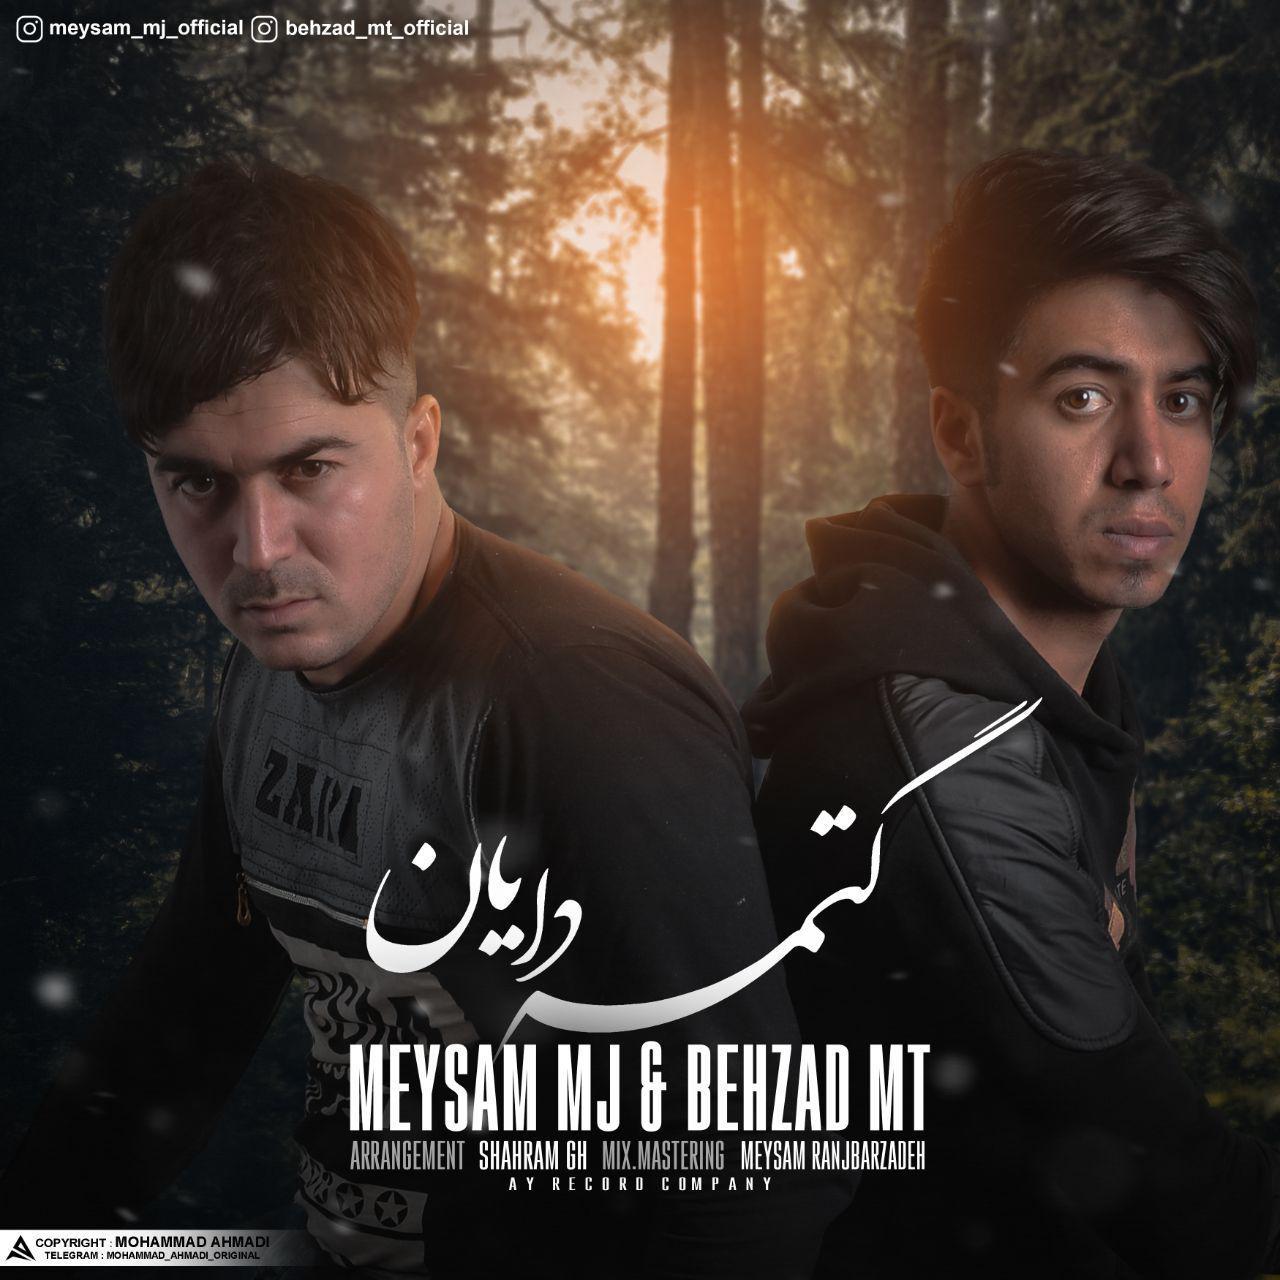 http://birtunes.ir/wp-content/uploads/2018/10/Meysam-M.J-Ft.-Behzad-M.T-Getma-Dayan.jpg